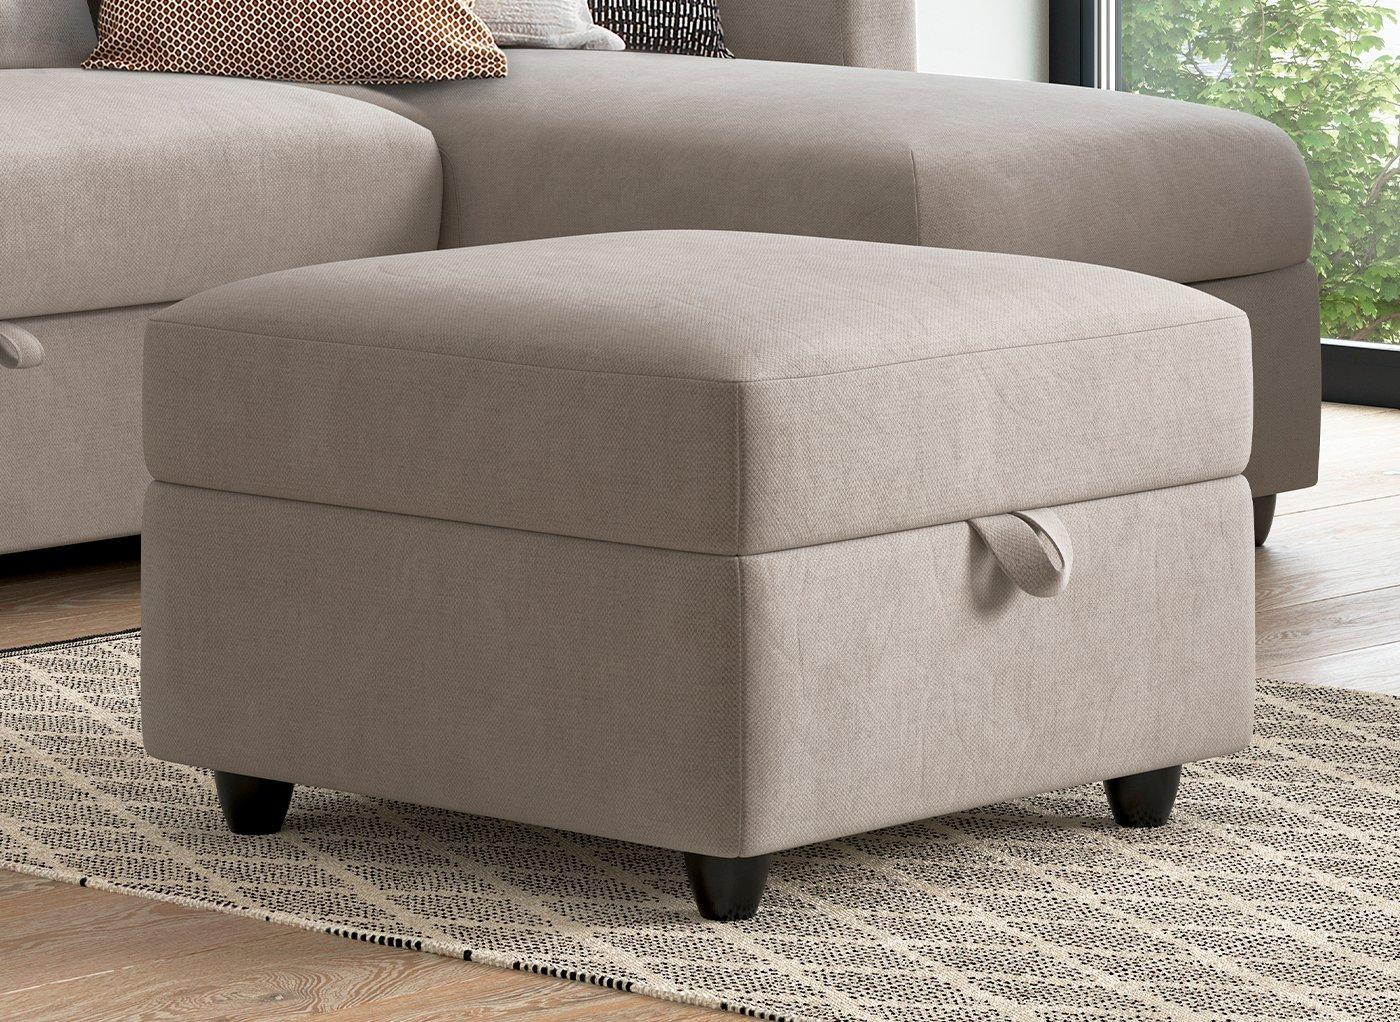 fabric-ottoman-footstool